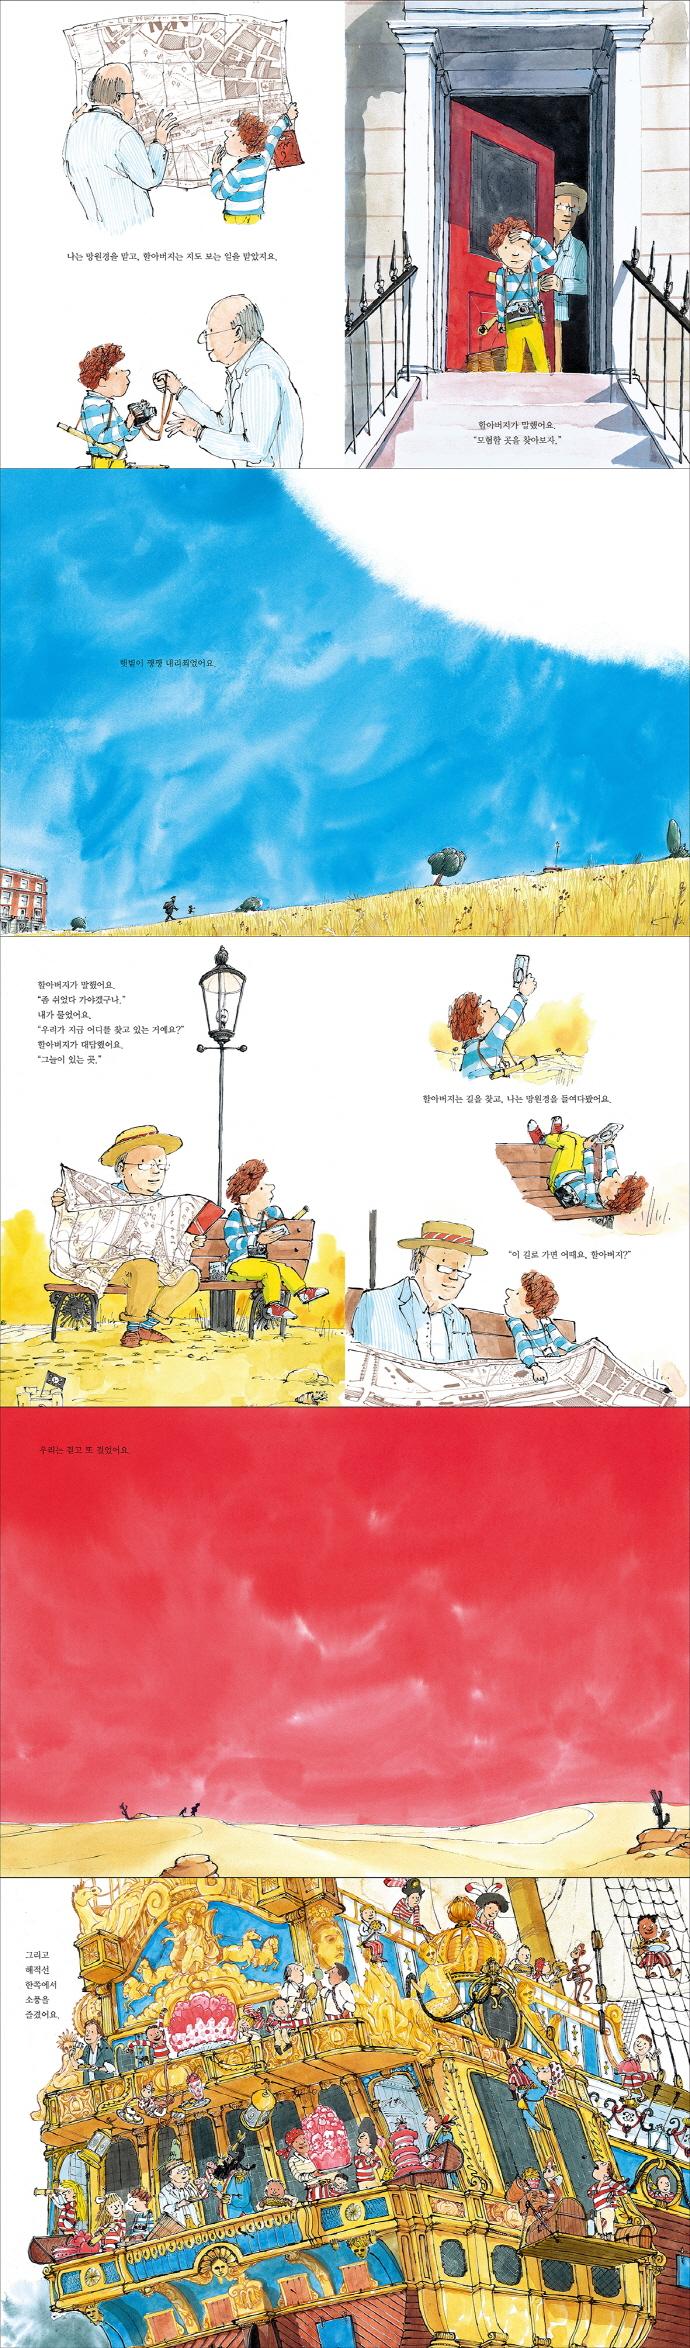 SUN: 햇볕 쨍쨍한 날의 기적(베스트 세계 걸작 그림책 46)(양장본 HardCover) 도서 상세이미지